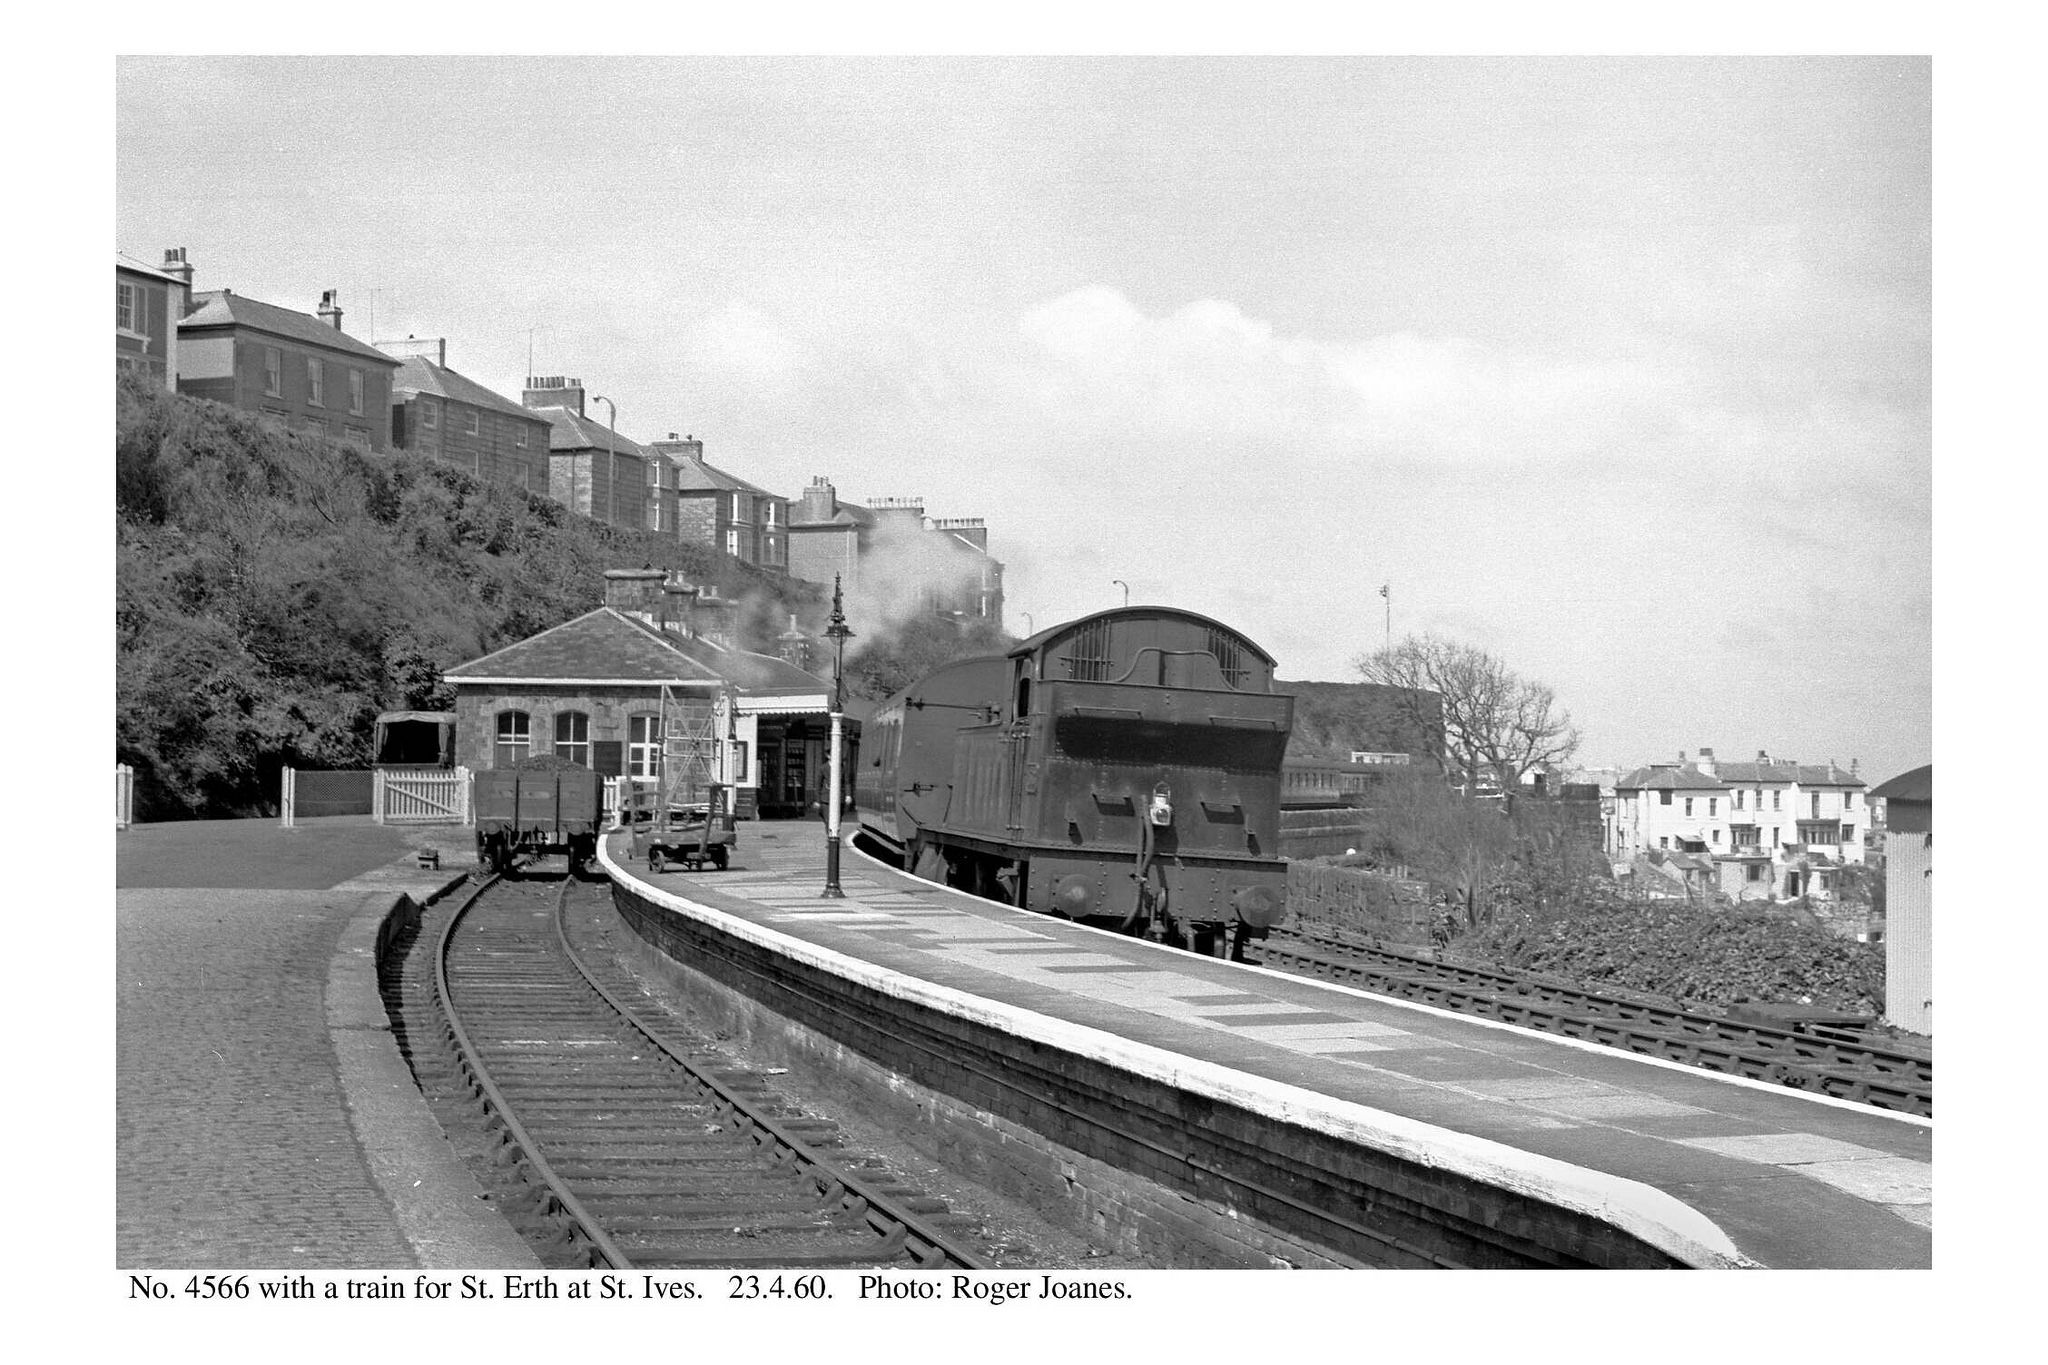 9510683b4667539bd23e84d2ffafa870 - Tinpot Railways: Terminal decline #3